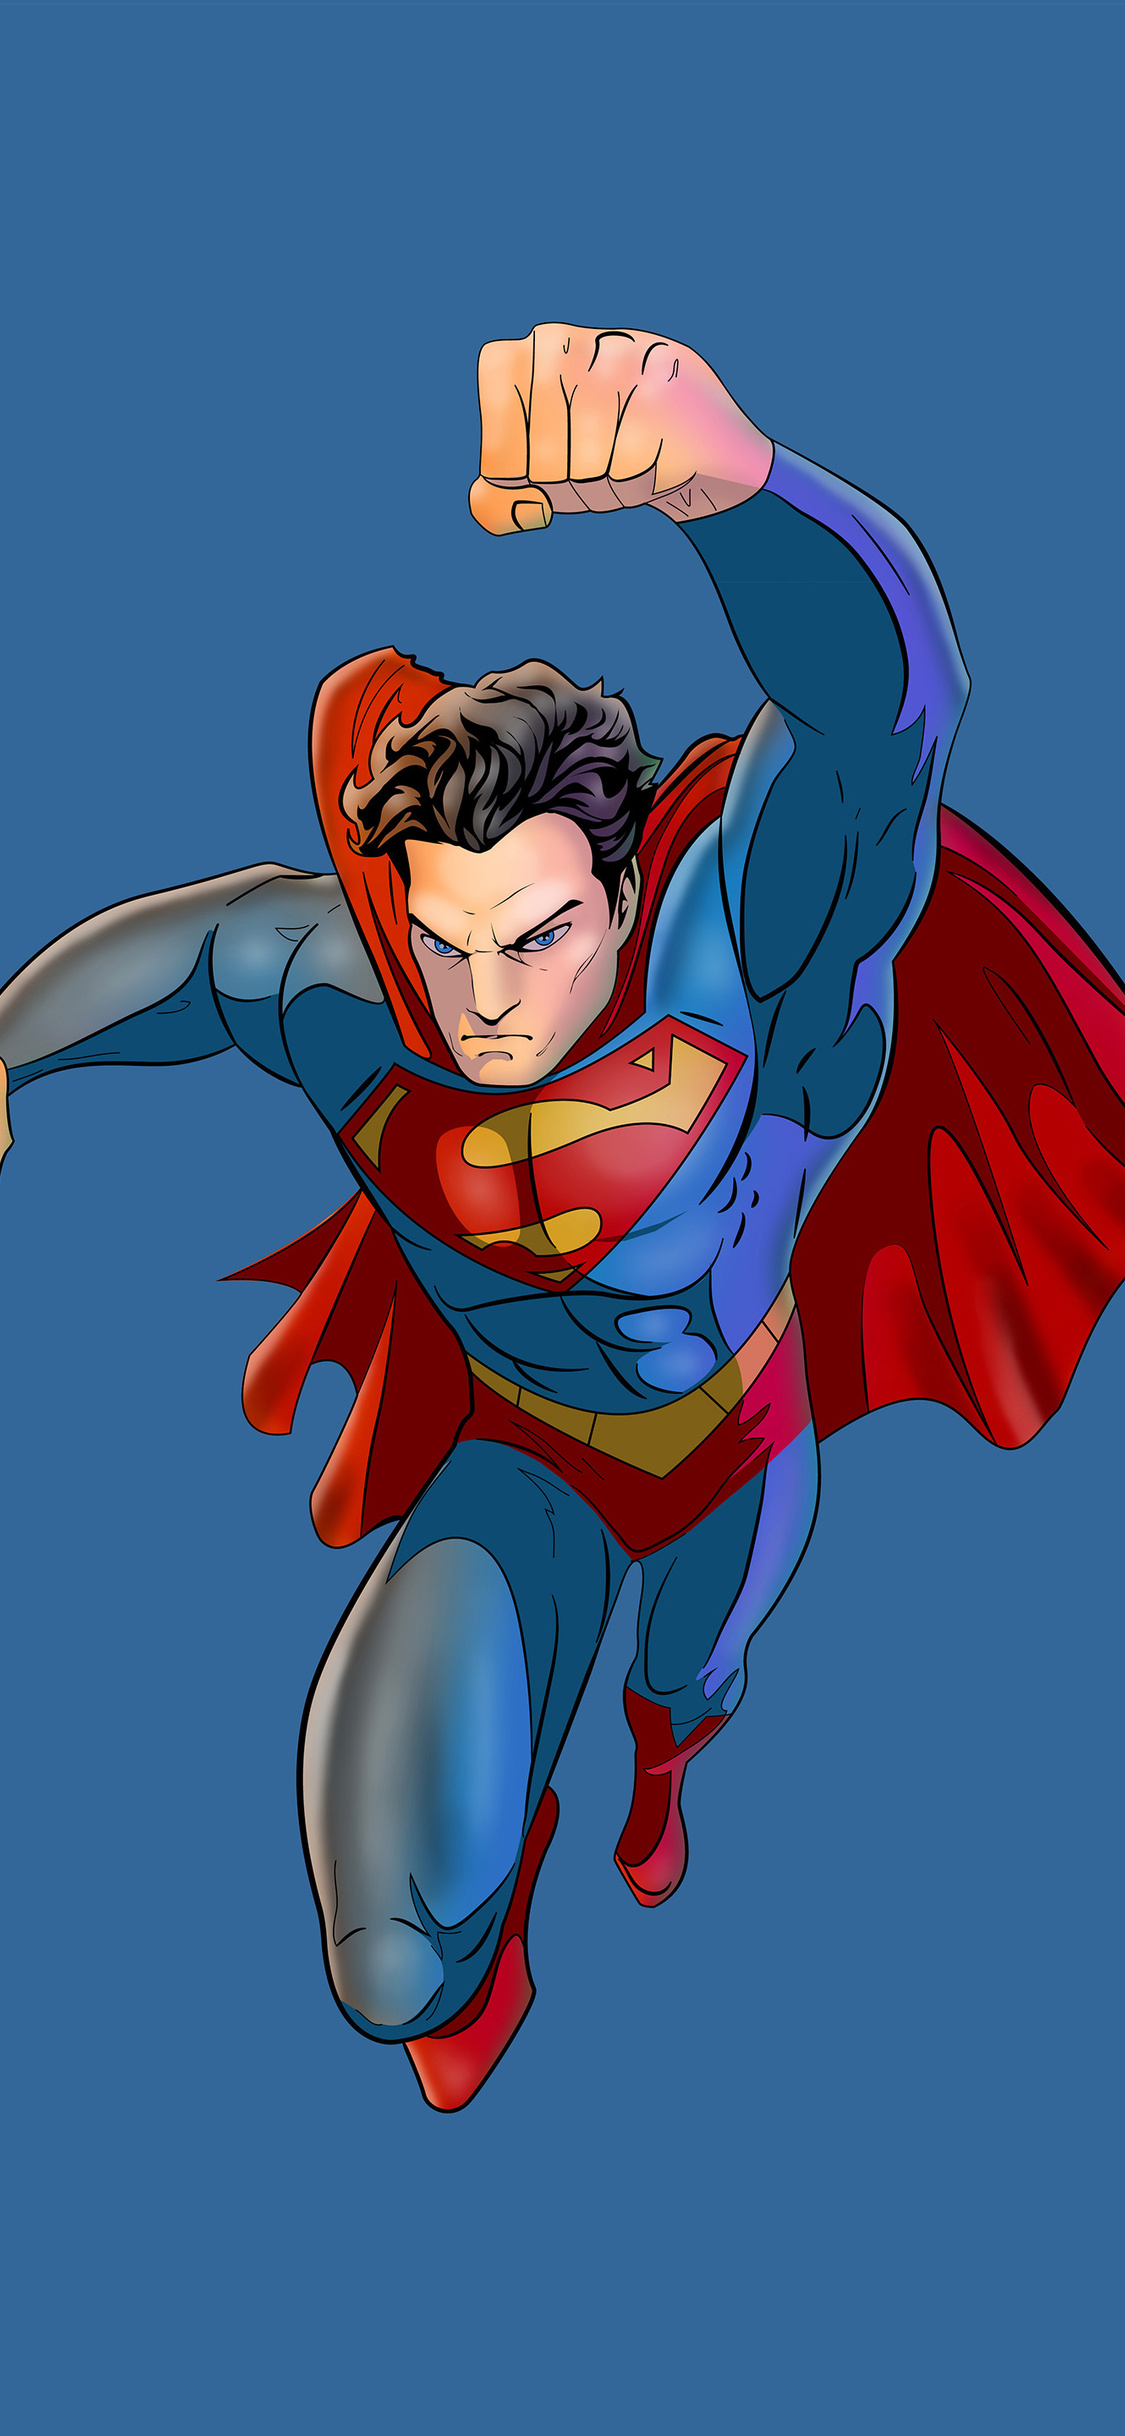 1125x2436 Superman Artwork 5k Iphone Xs Iphone 10 Iphone X Hd 4k